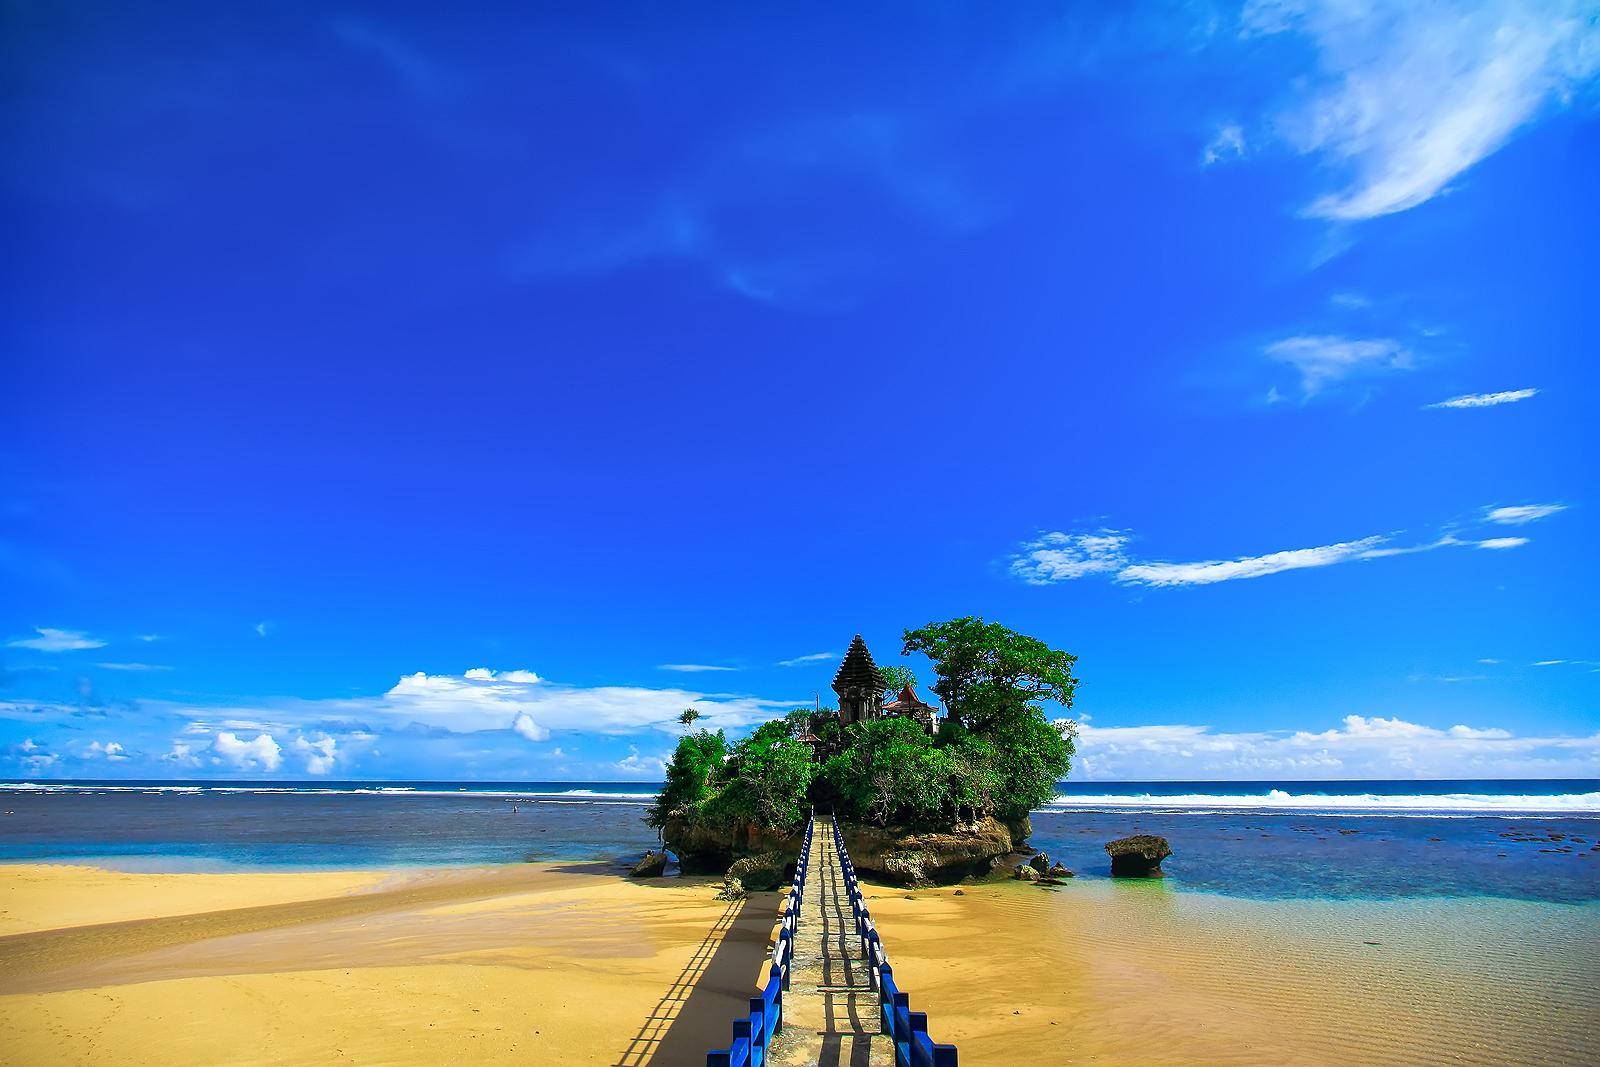 Mudik Malang Destinasi Bisa Kamu Sambangi Bello Id Indahnya Pantai